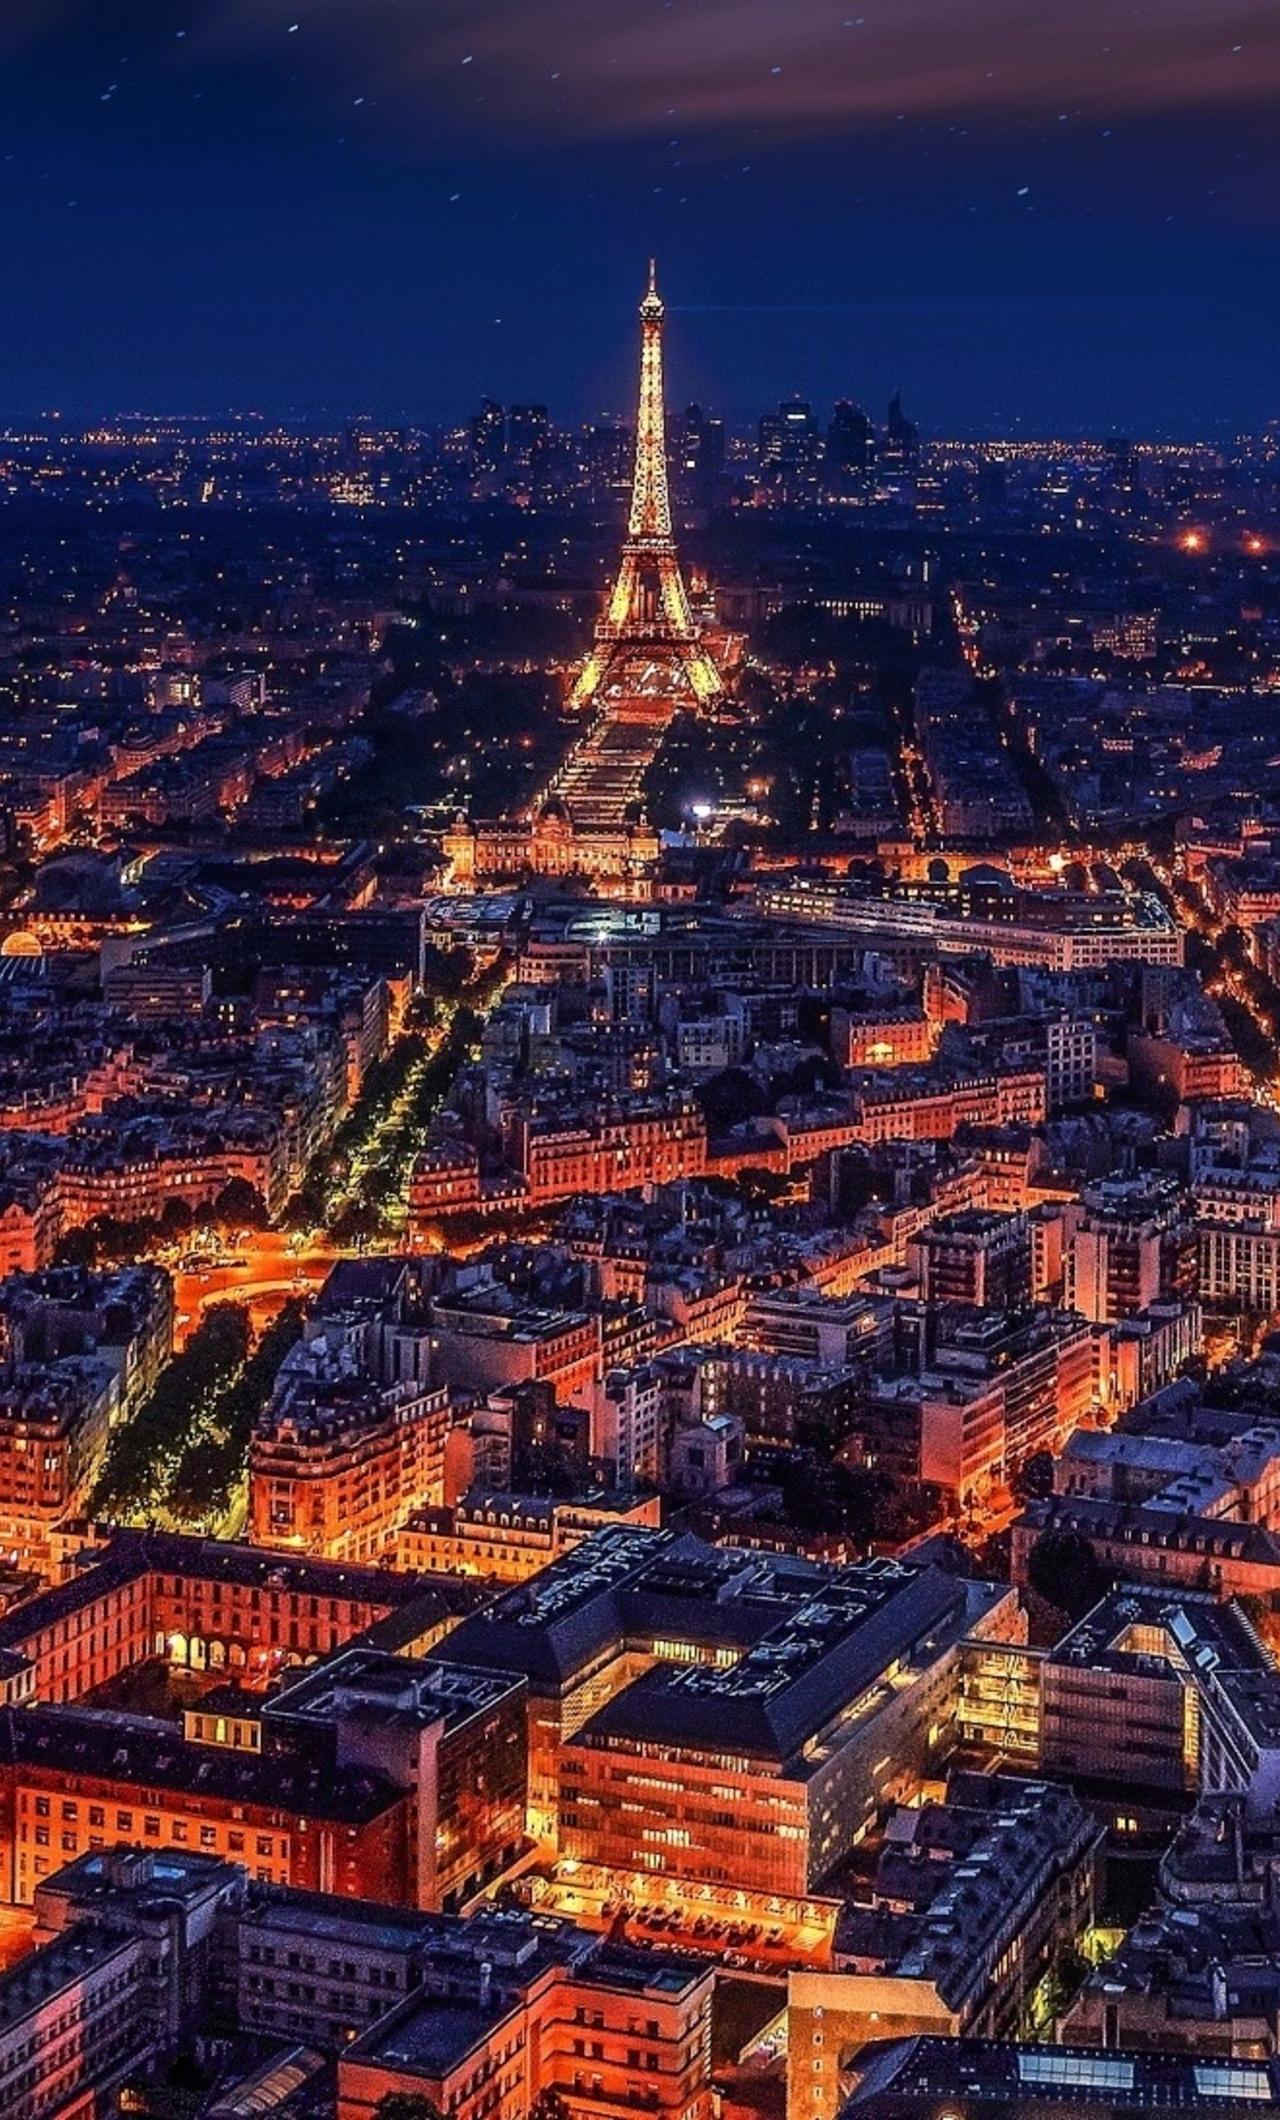 1280x2120 Paris France Eiffel Tower Night Iphone 6 Hd 4k Wallpapers